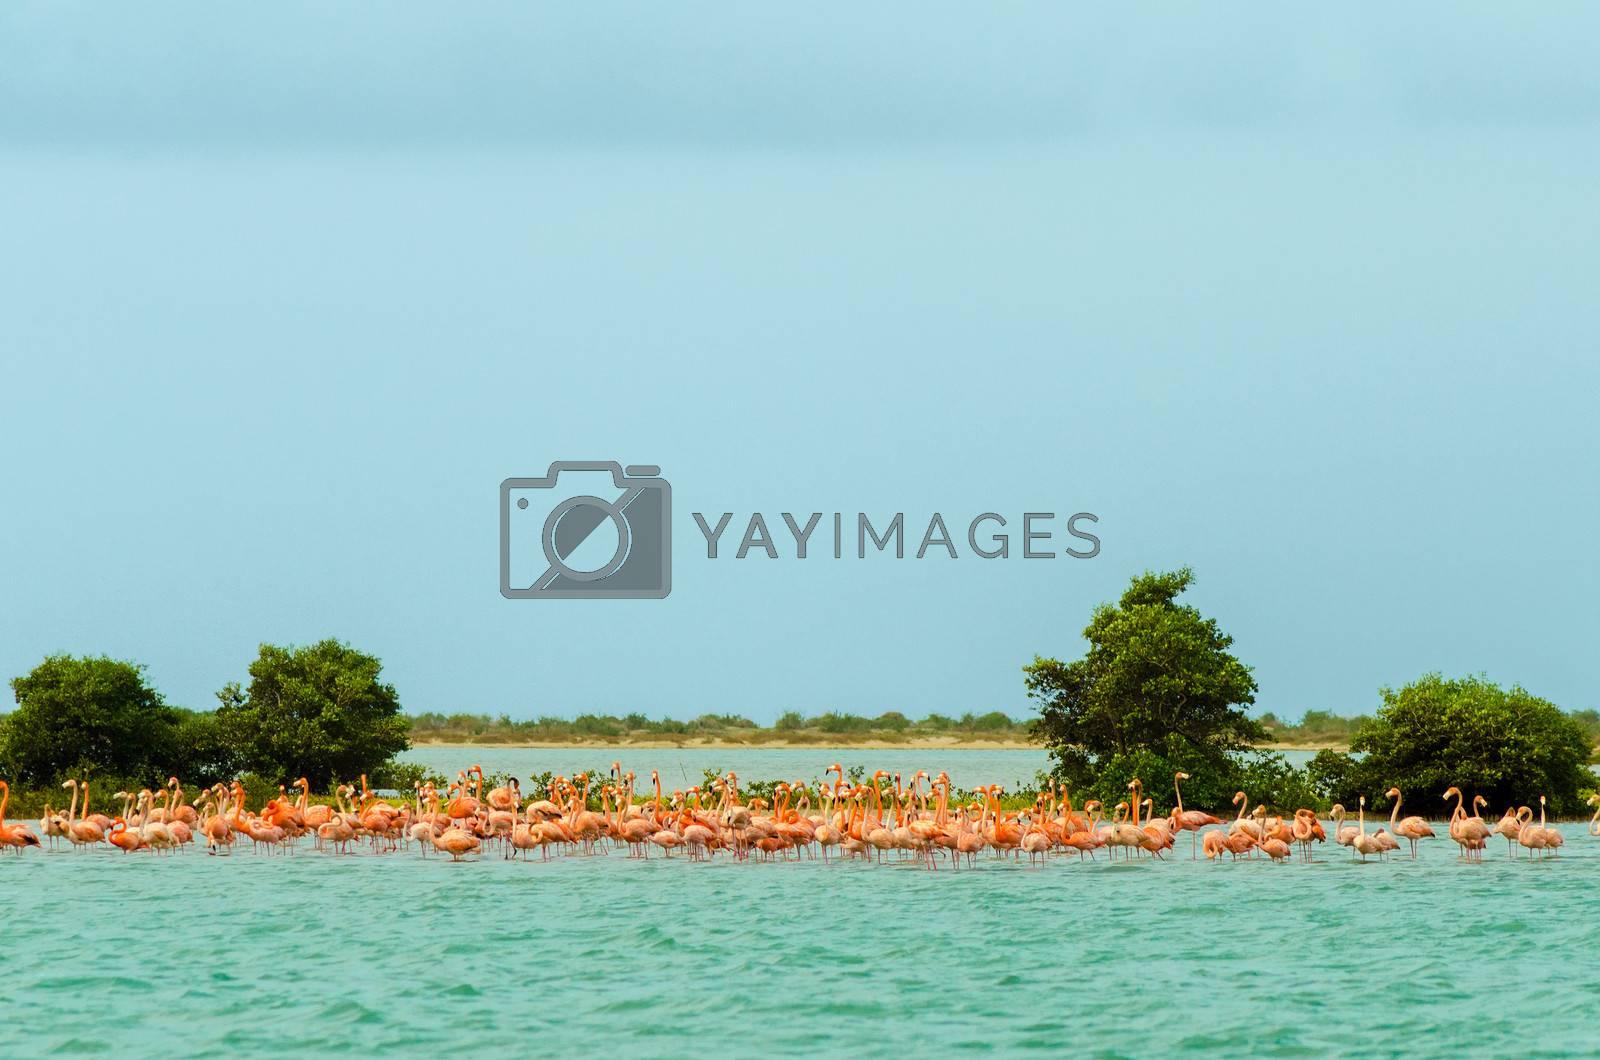 Large flock of flamingos in the Caribbean Sea in La Guajira, Colombia